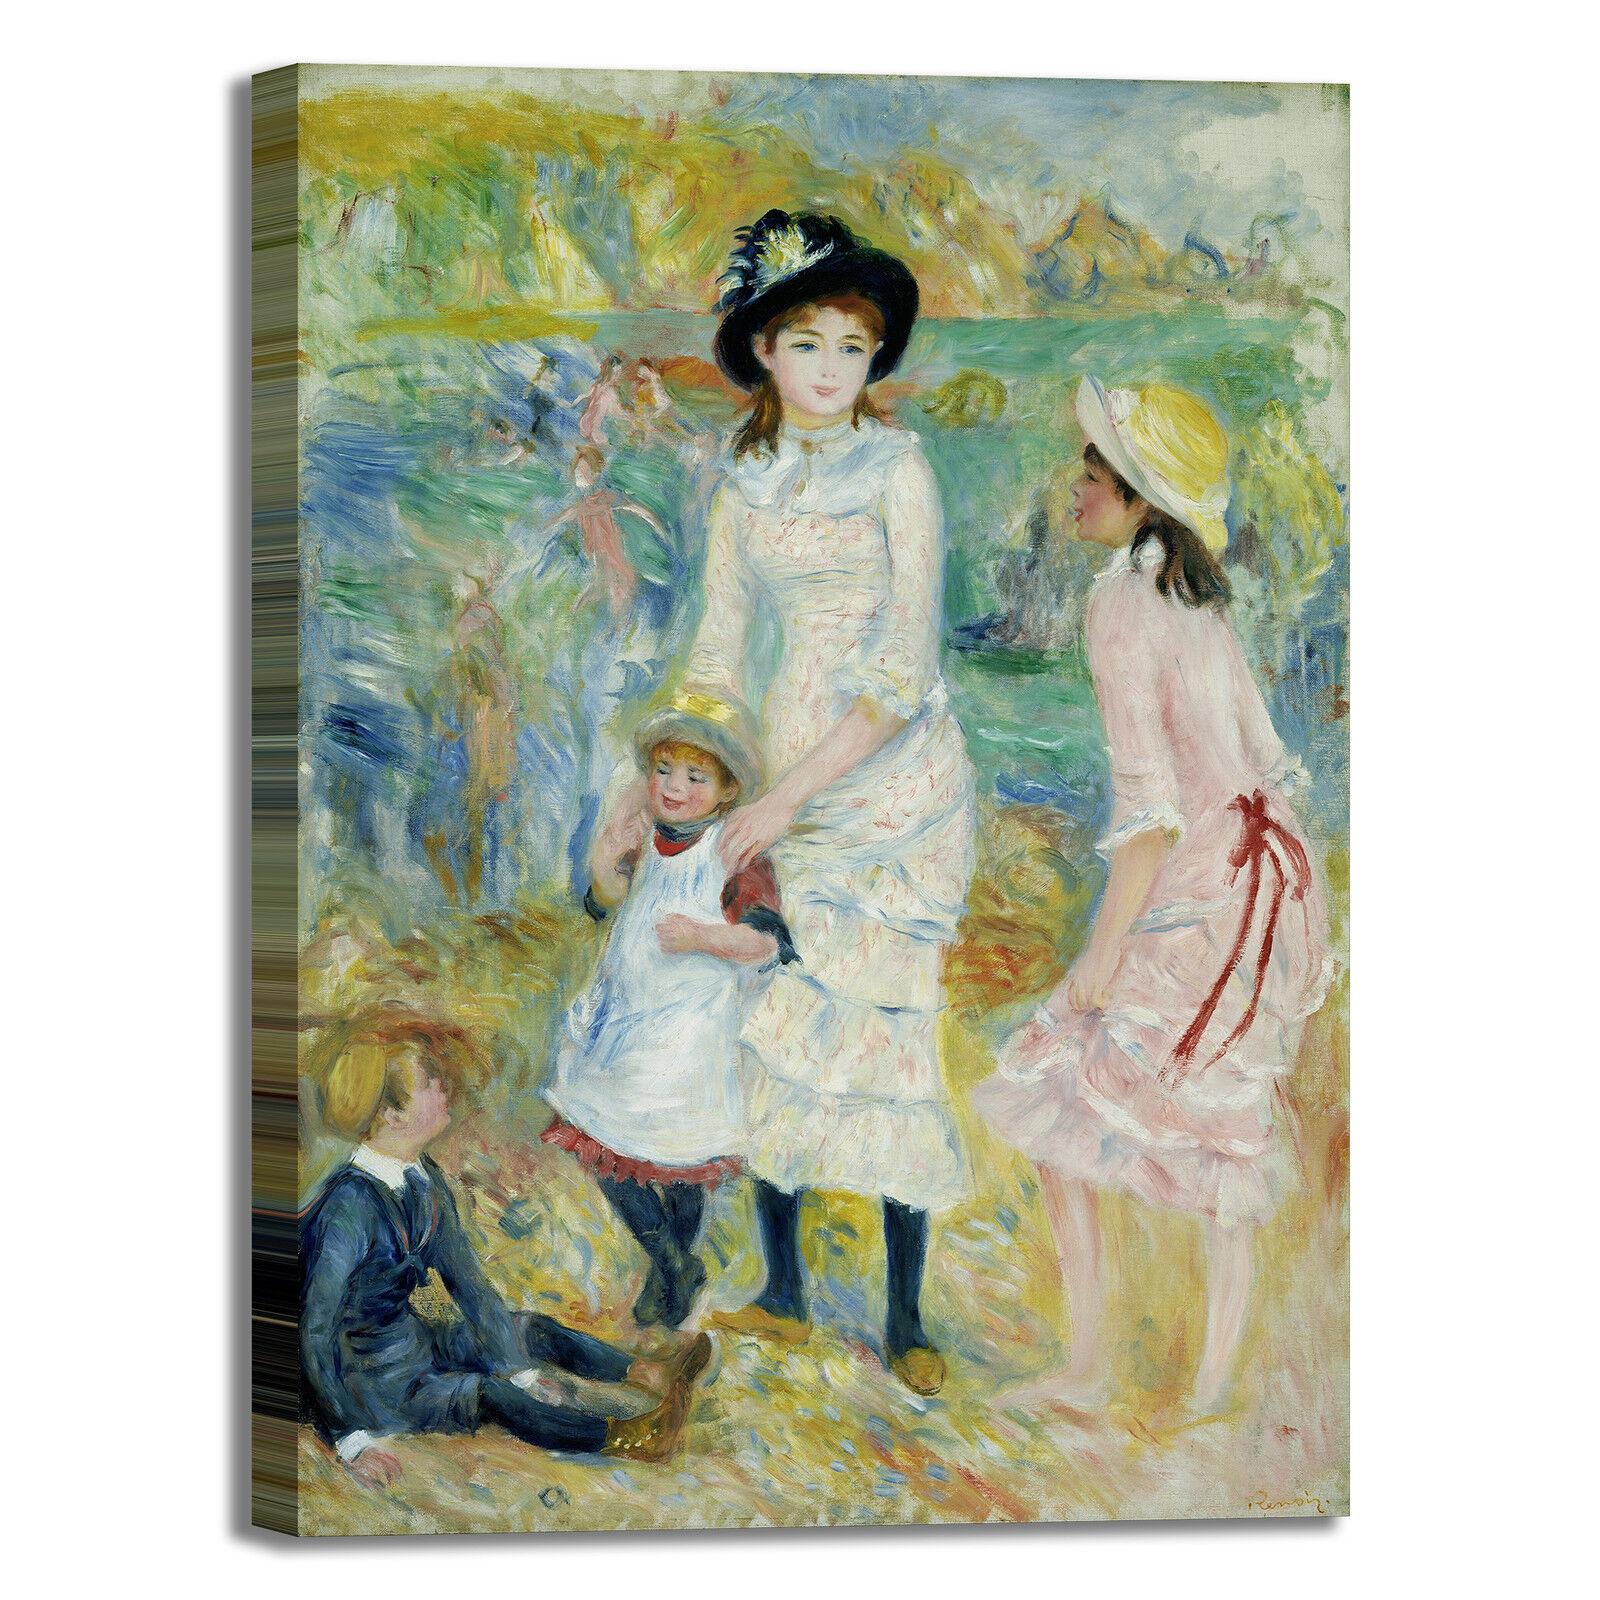 Reschwarz bambini in riva al mare quadro stampa tela dipinto telaio arroto casa